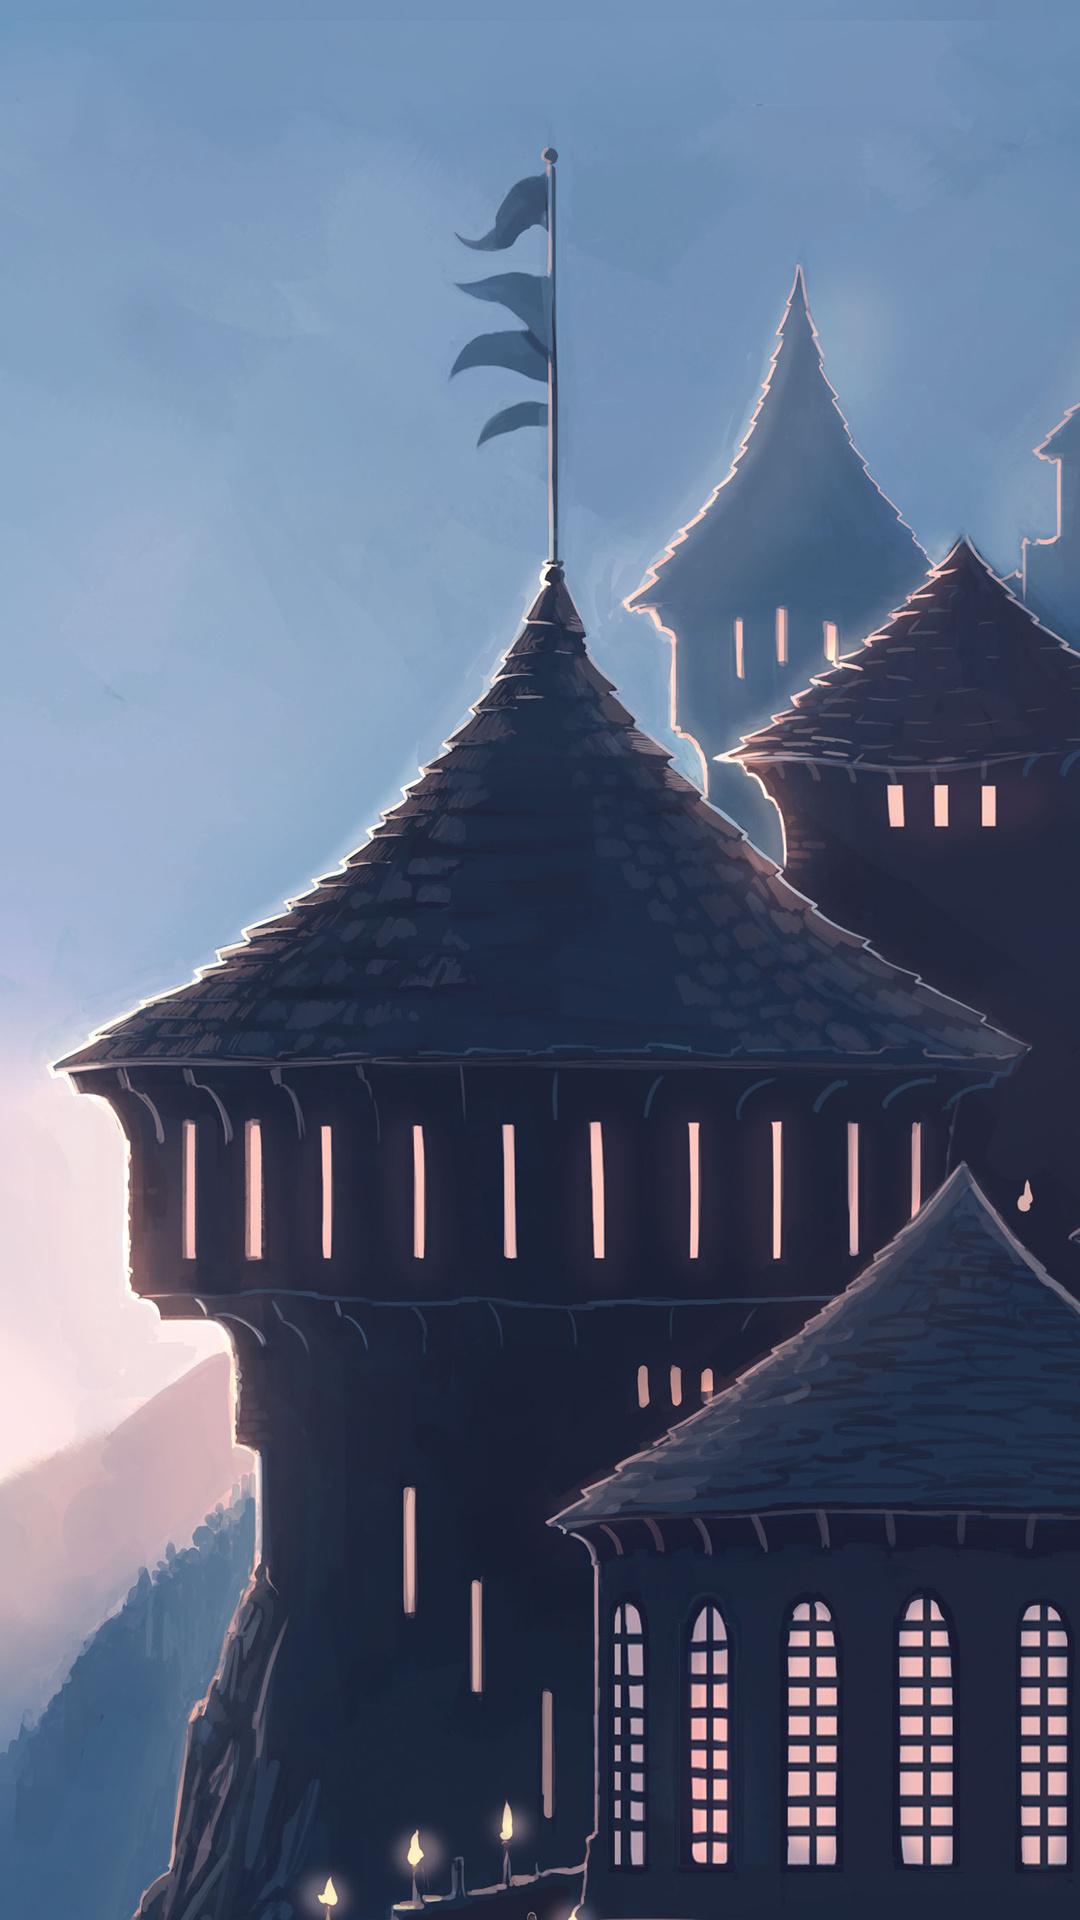 1080x1920 Hogwarts Harry Potter School 5k Iphone 76s6 Plus Pixel